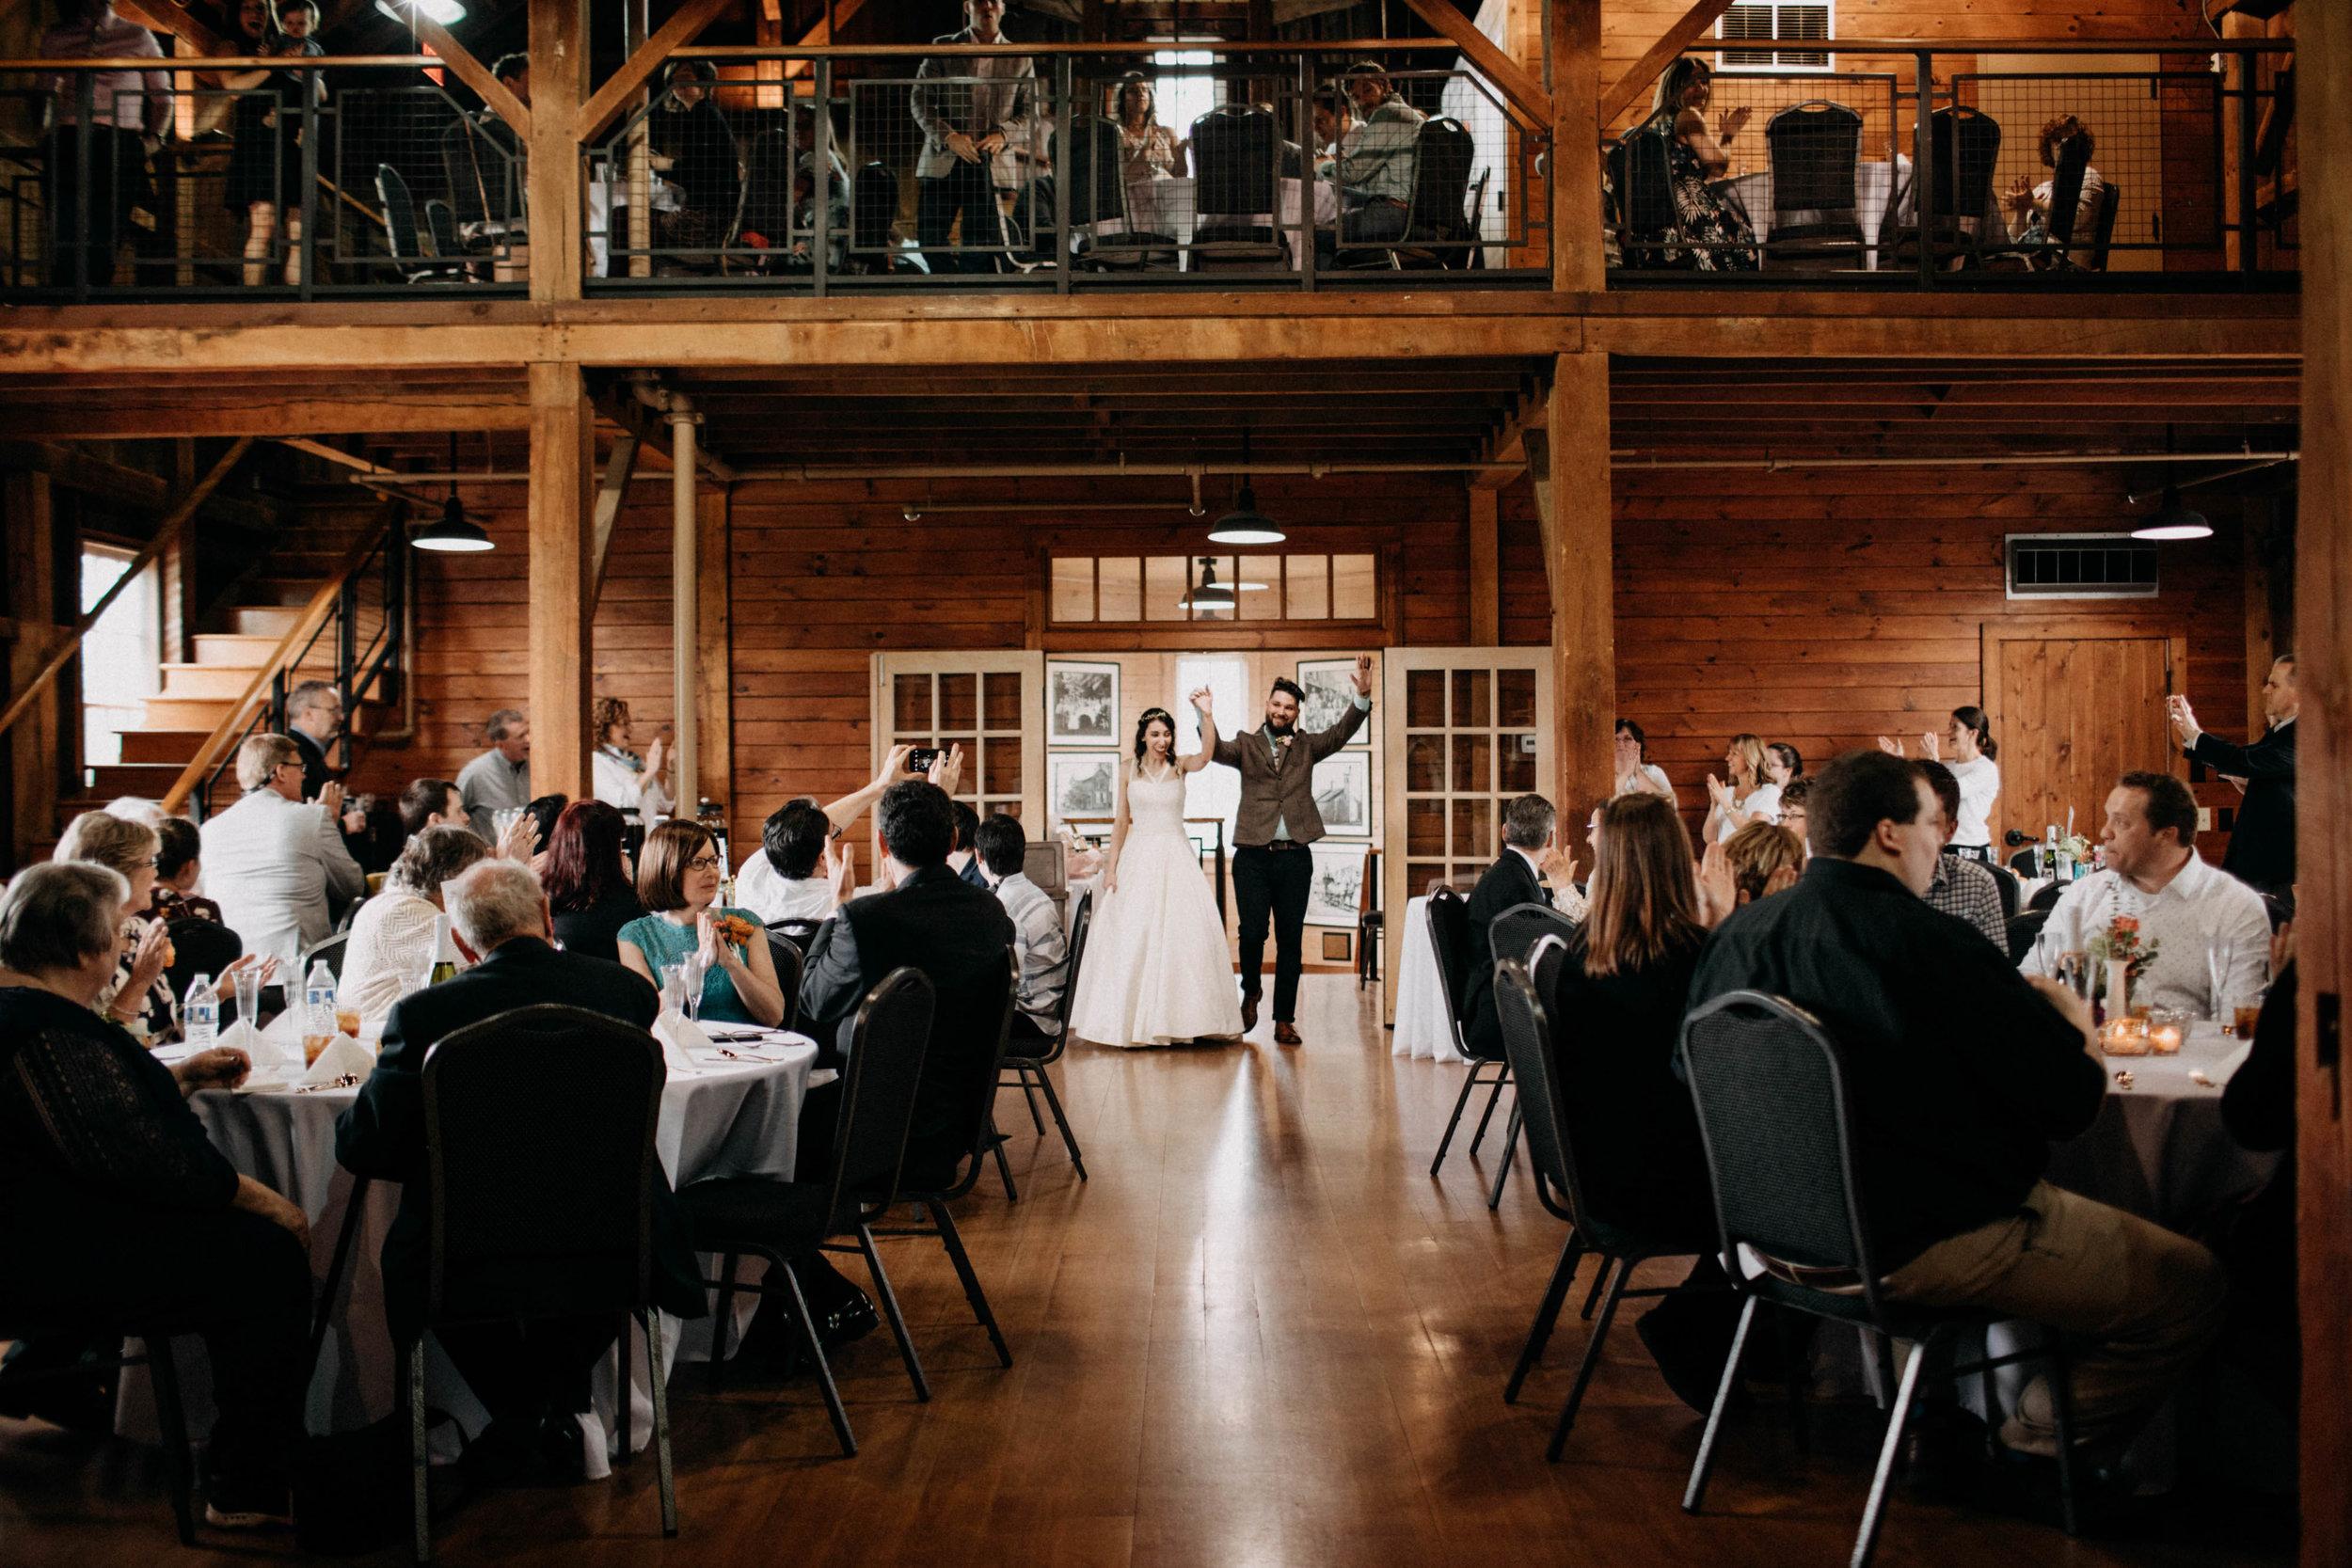 Columbus, Ohio Wedding Photographer Everal Barn At Heritage Park Wedding Venue Grace E Jones Photography244.jpg